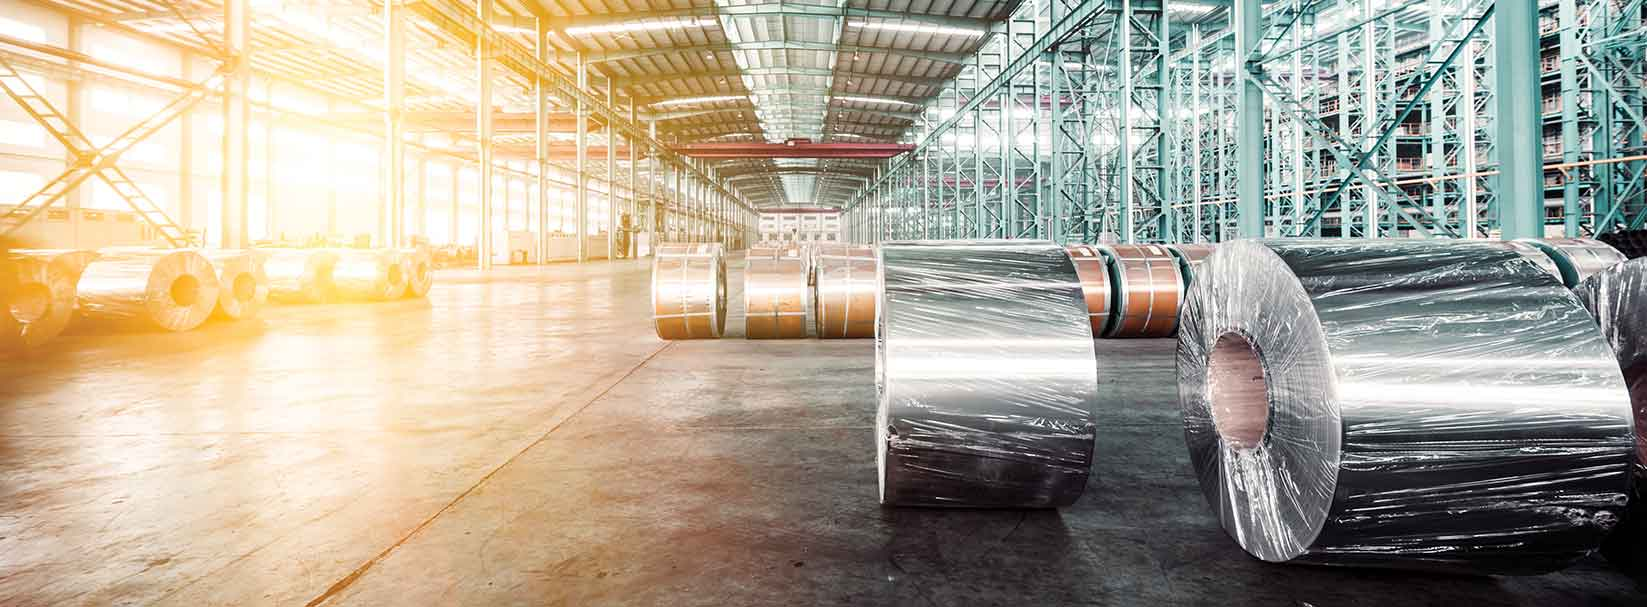 Shrinking Sydney drives changes in industrial warehousing developments